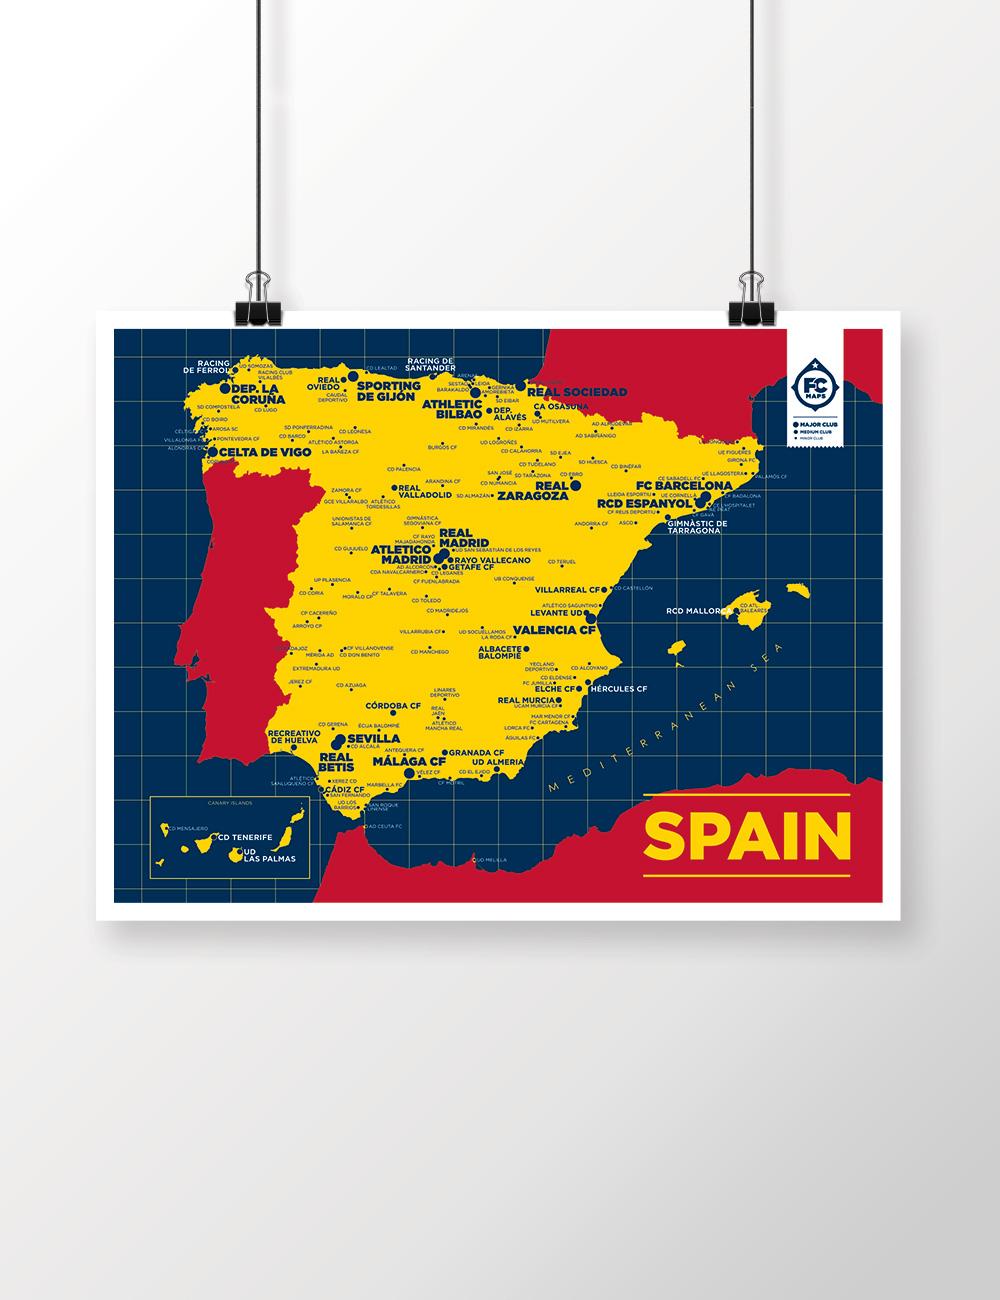 Spain Map Football Club Maps